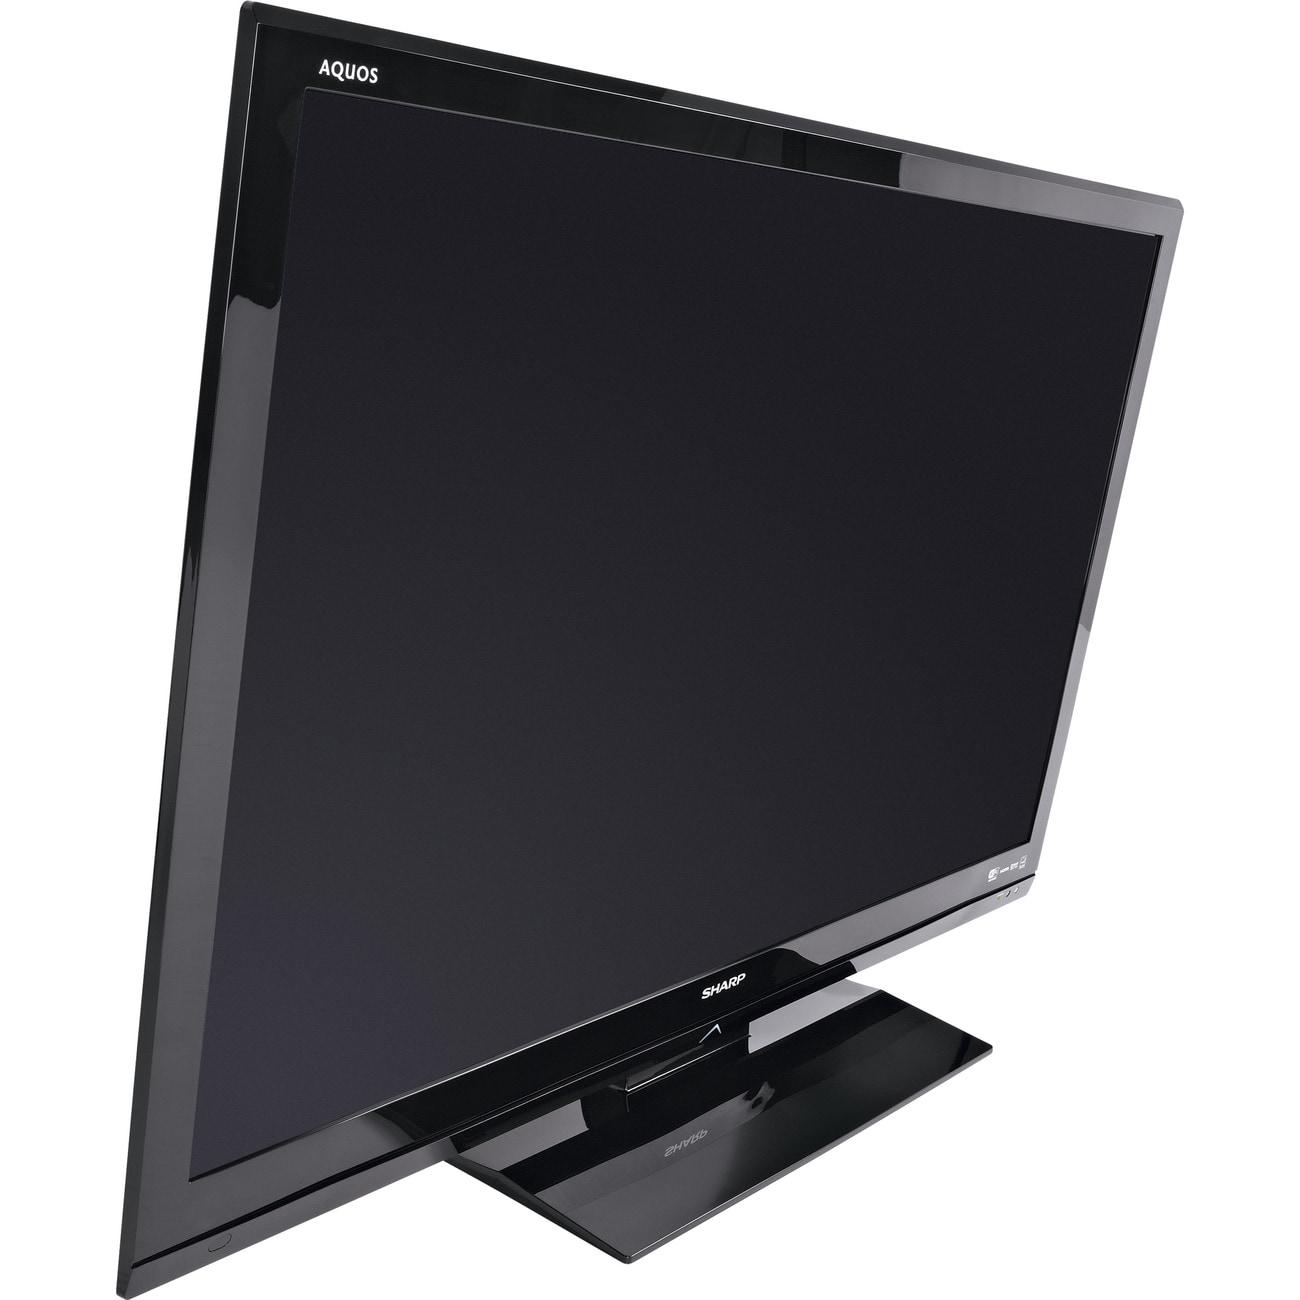 "Sharp AQUOS LC-46LE540U 46"" 1080p LED-LCD TV - 16:9 - HDTV 1080p - 12"